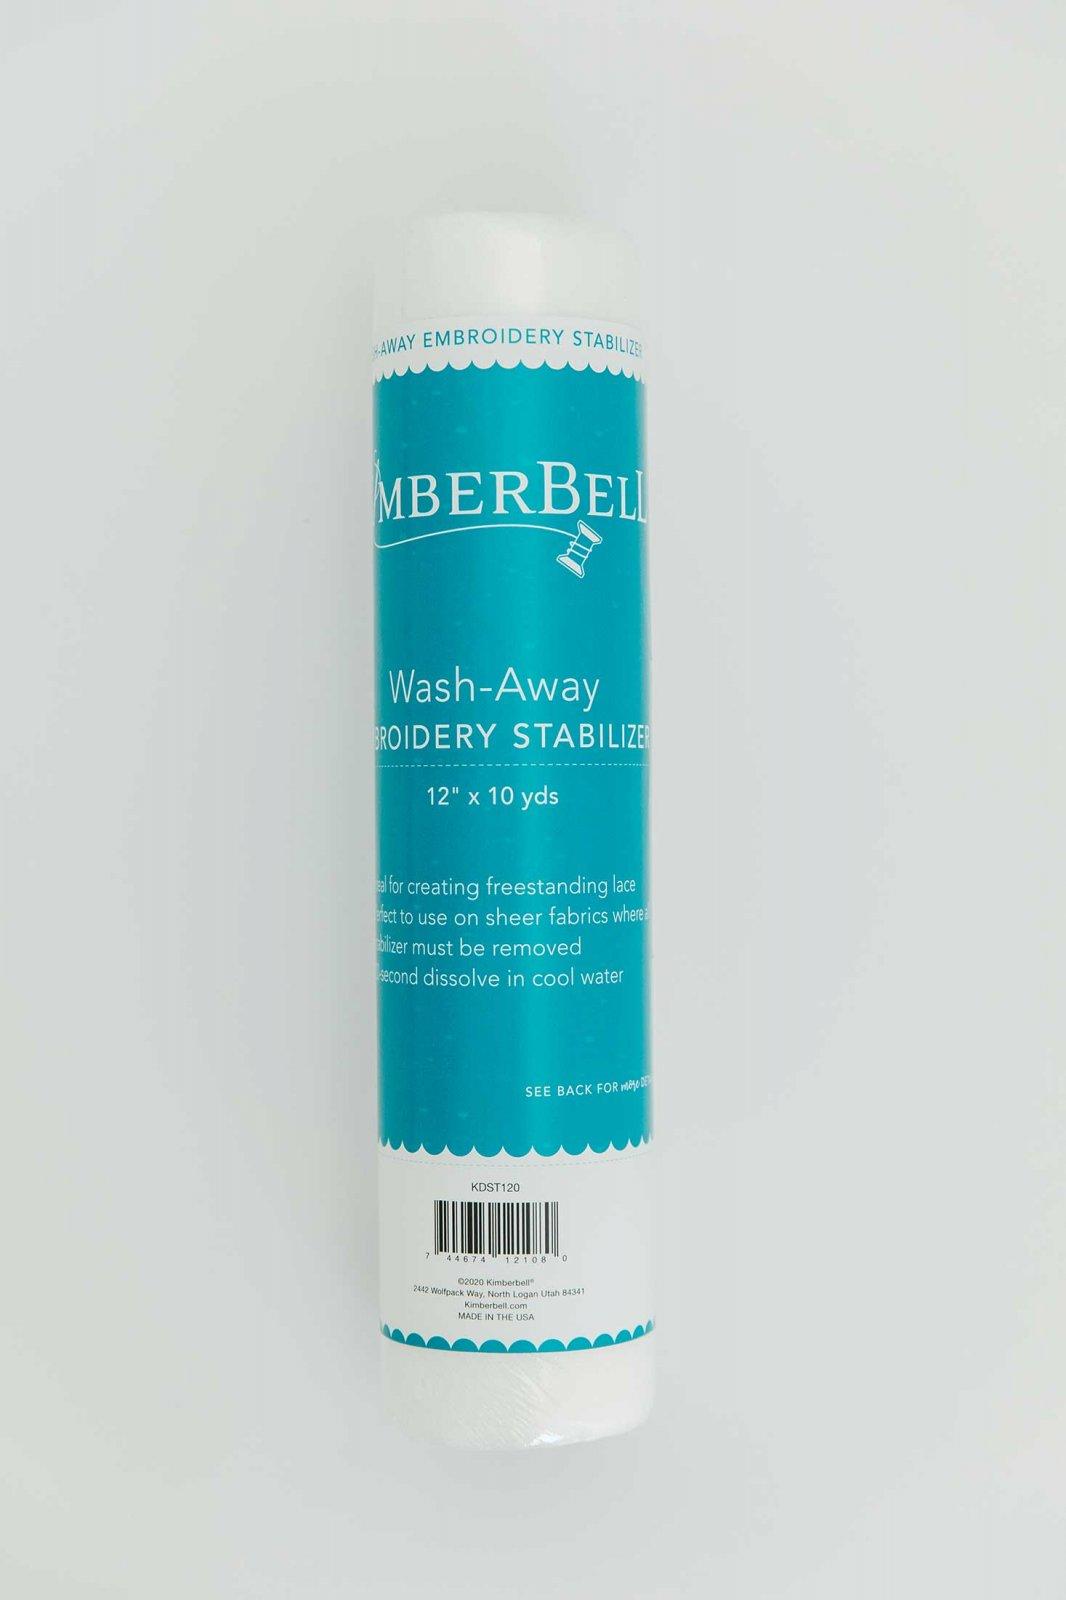 Kimberbell Wash-Away Stabilizer